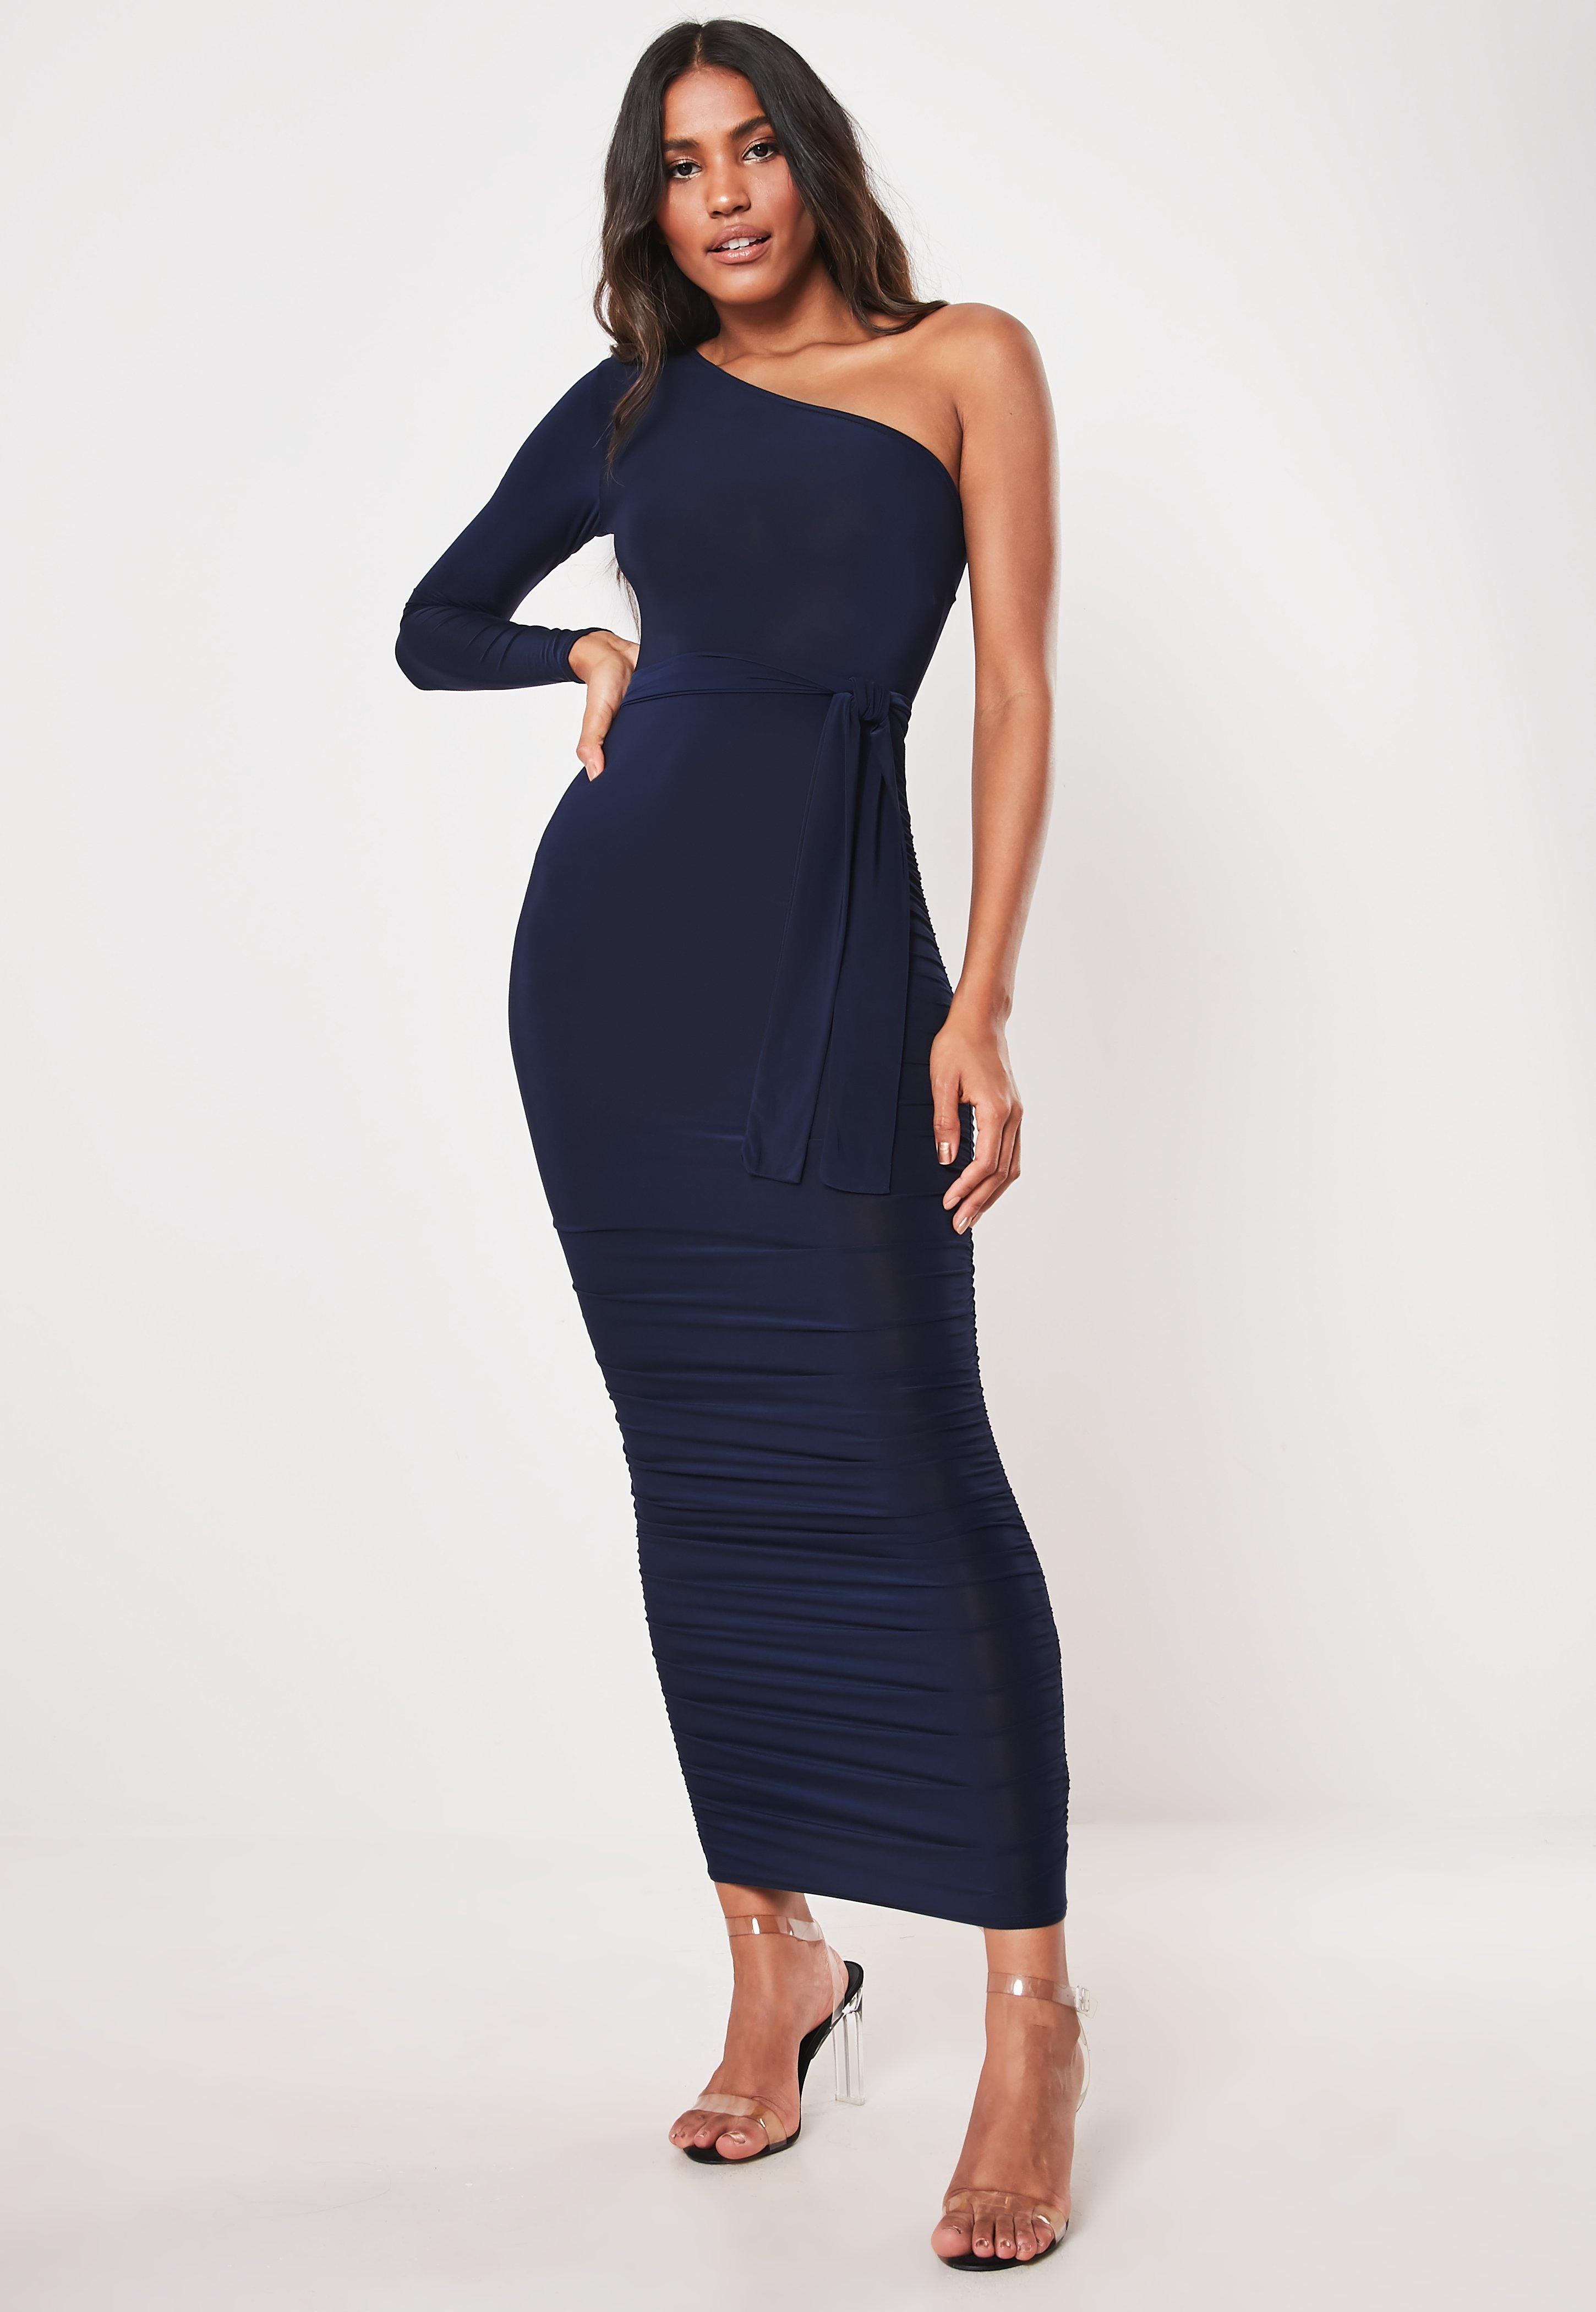 6558fab14eb Bodycon Dresses